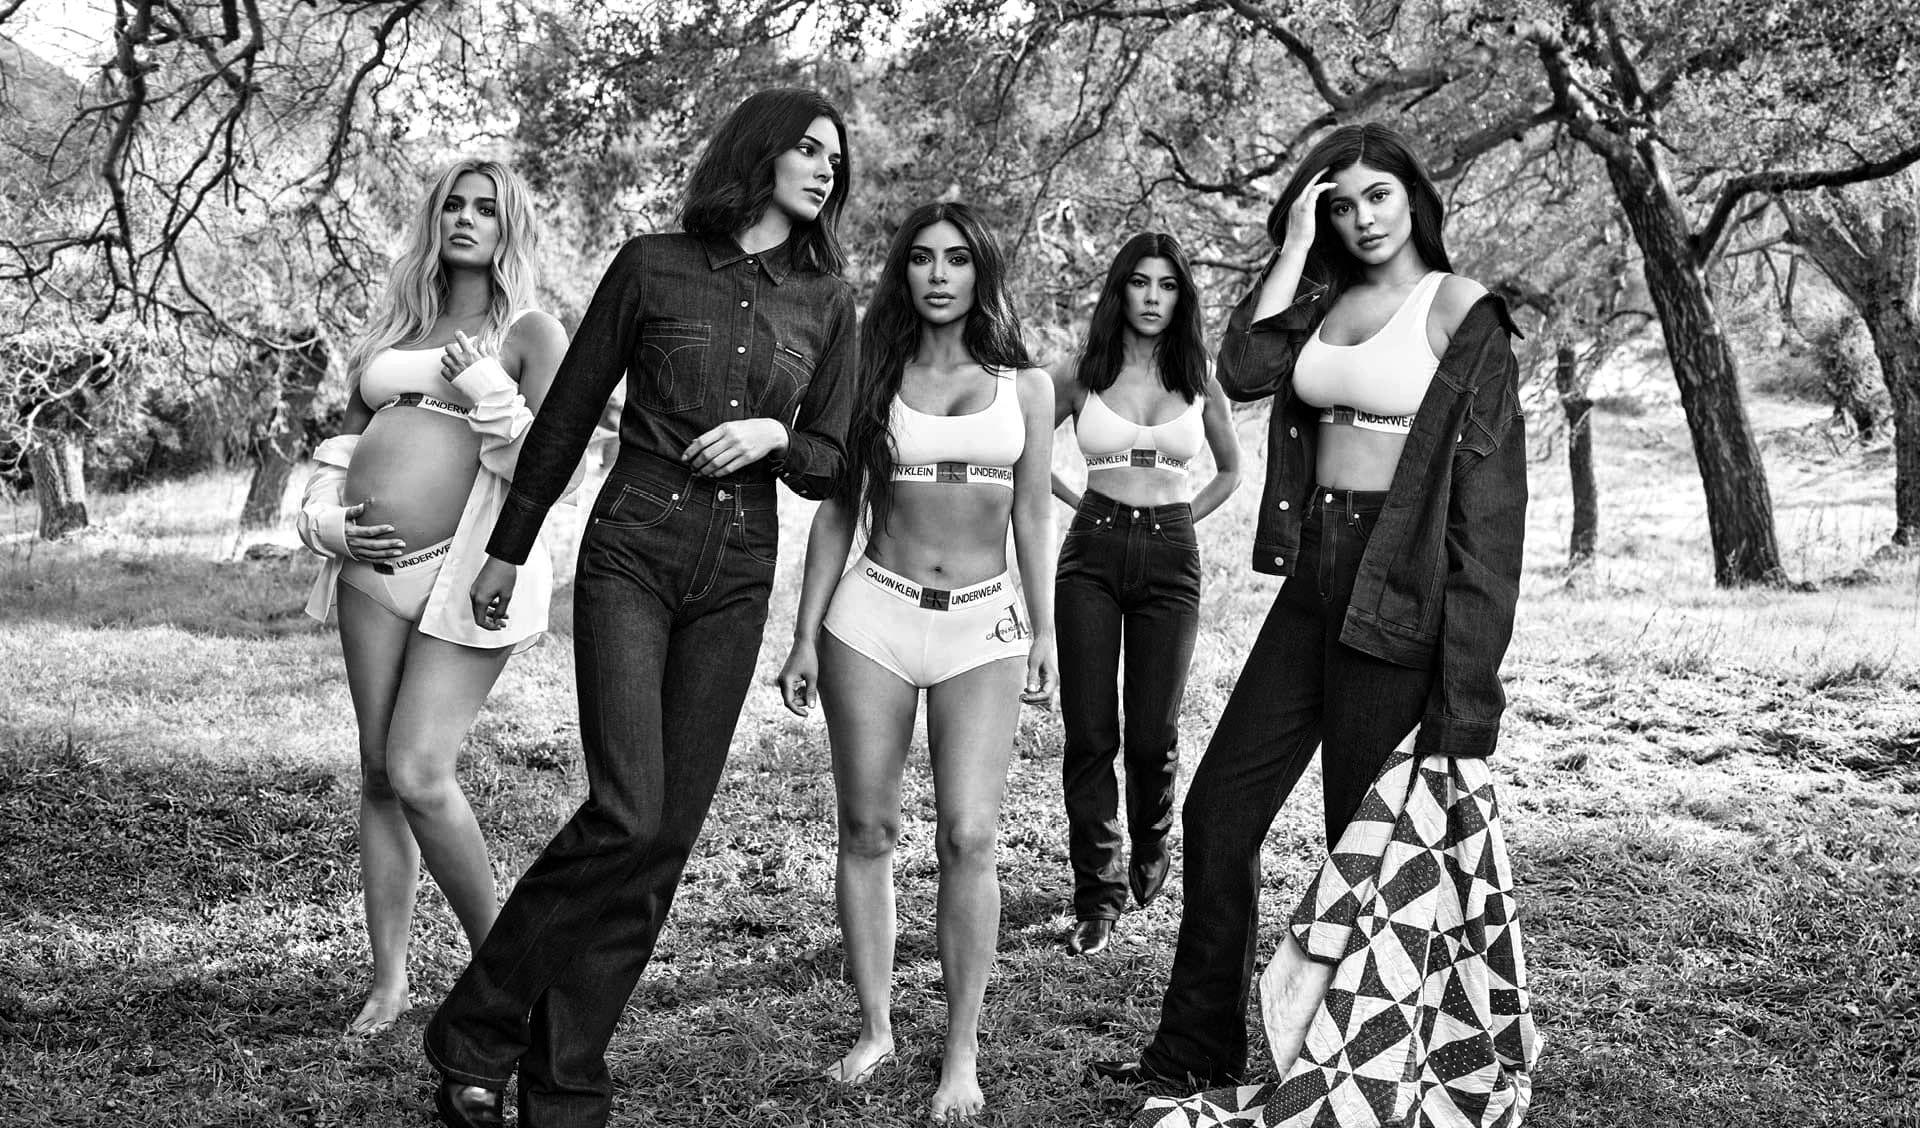 Рекламная кампания Calvin Klein #MYCALVINS 2018 с семейством Кардашьян-Дженнер